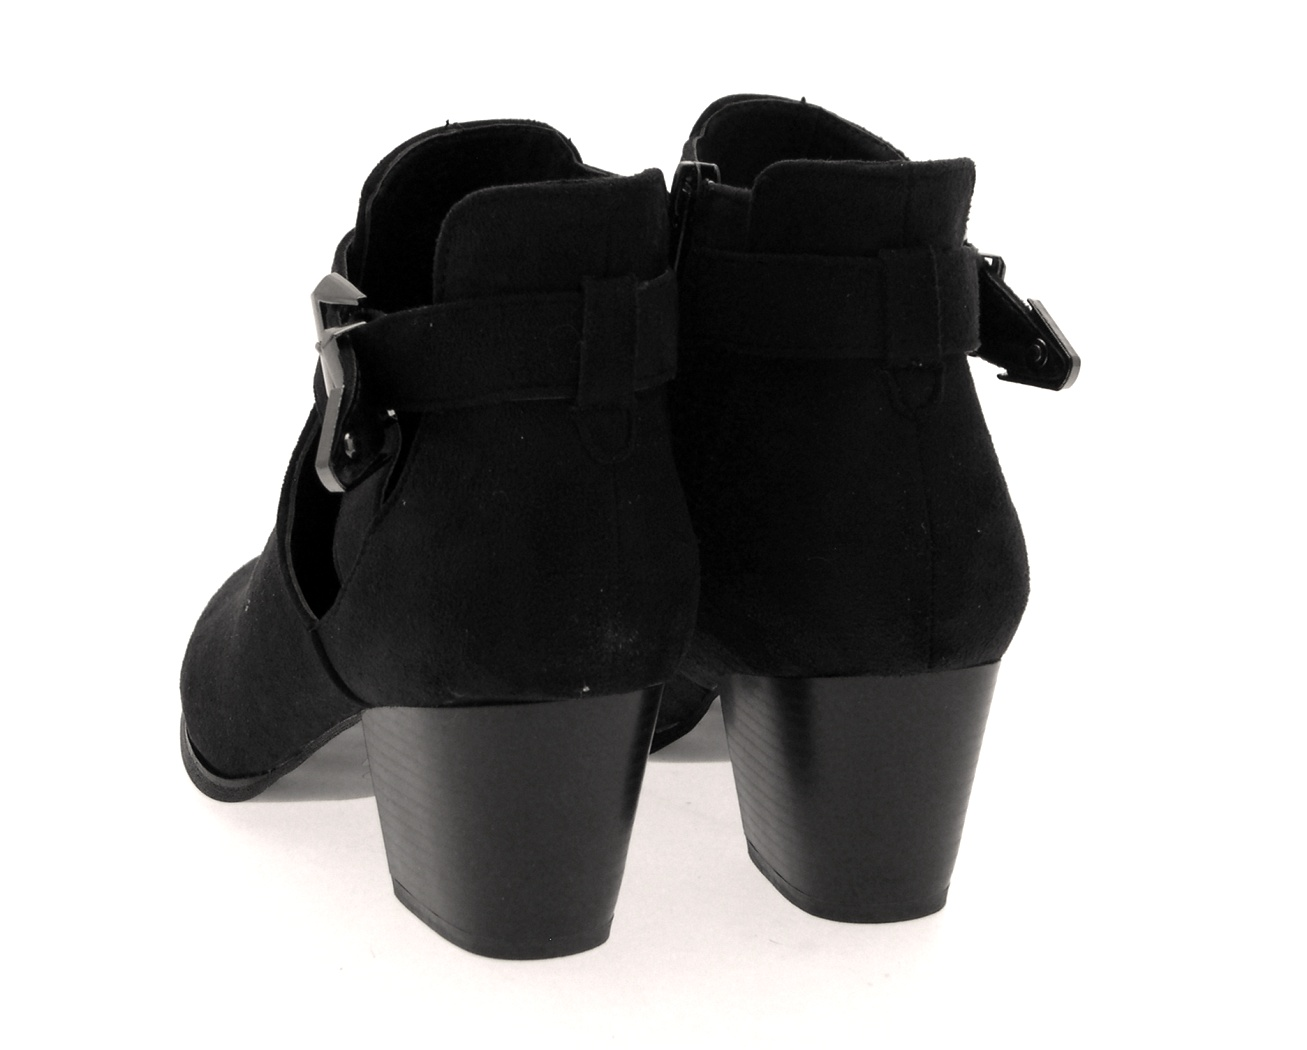 damen cut out ankle boots mid blockabsatz heels schnalle. Black Bedroom Furniture Sets. Home Design Ideas